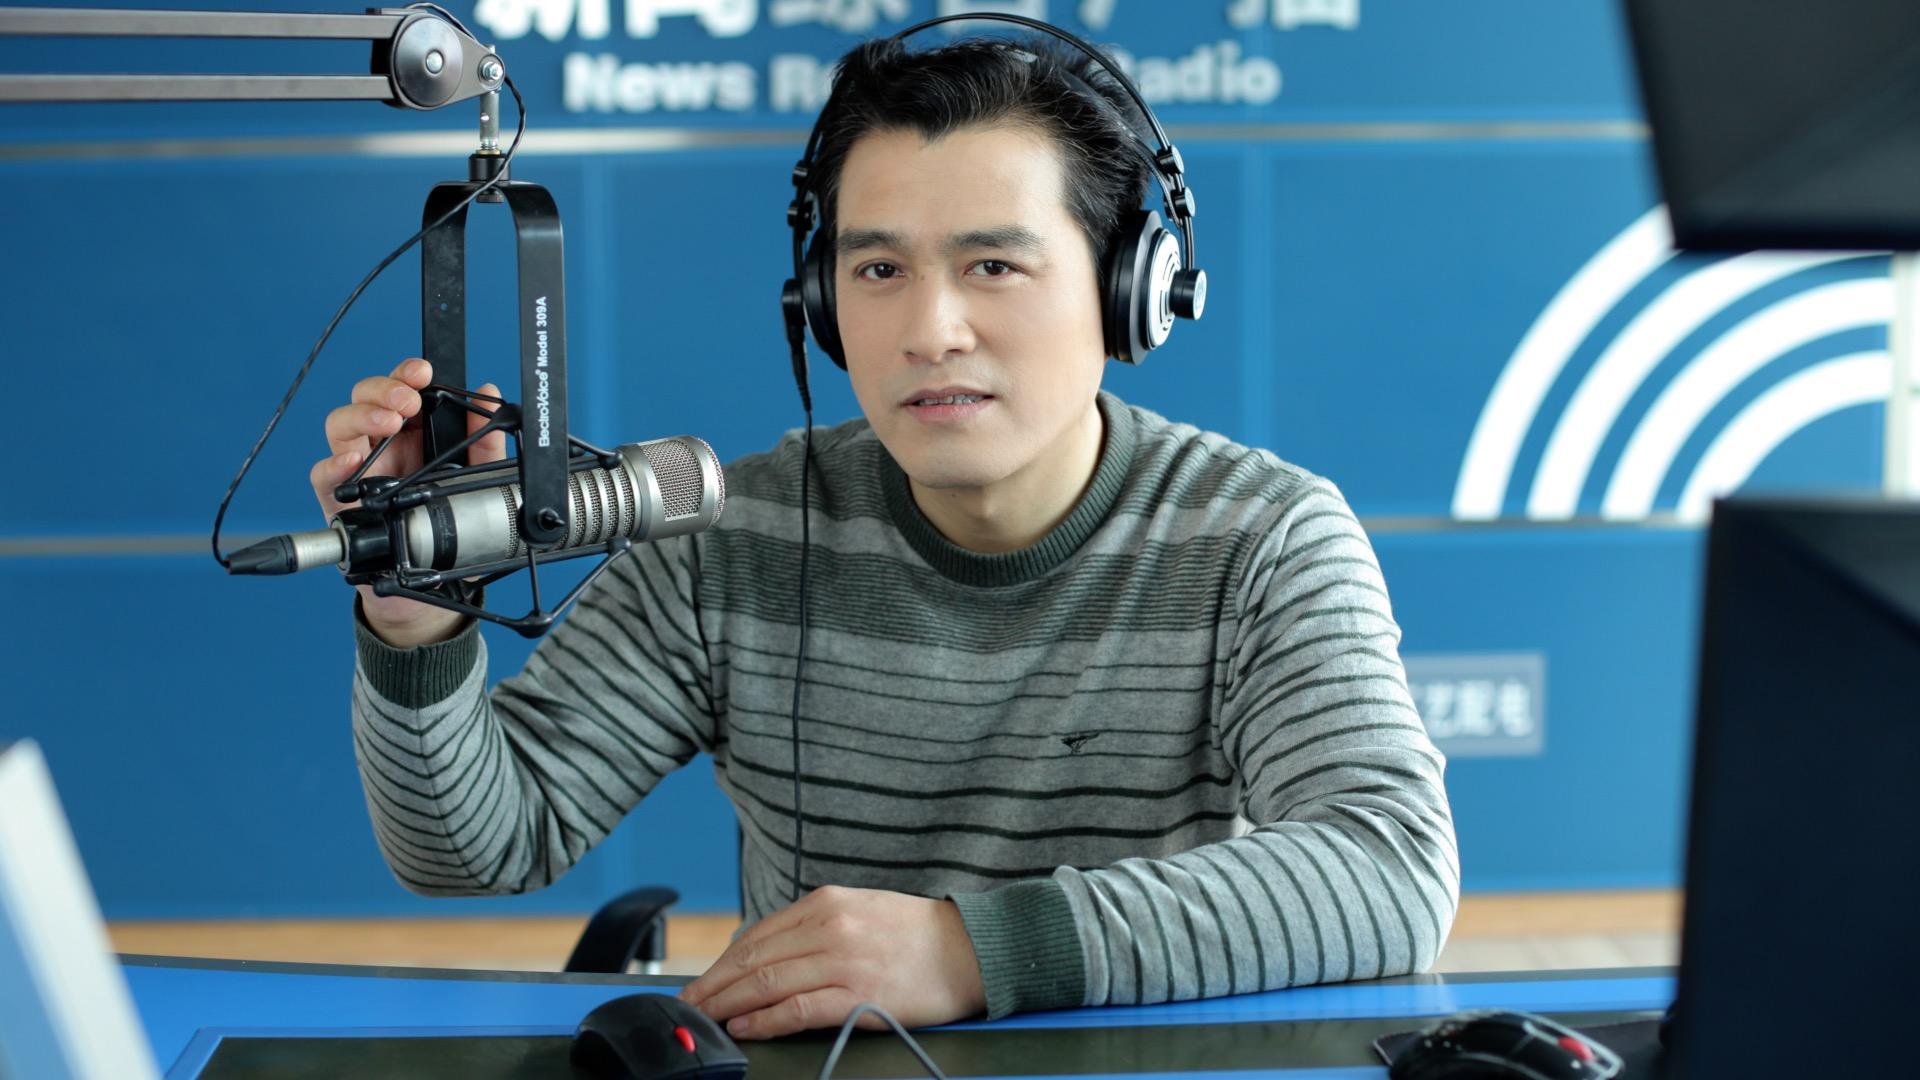 Cui Xiaodong - the man behind the mics